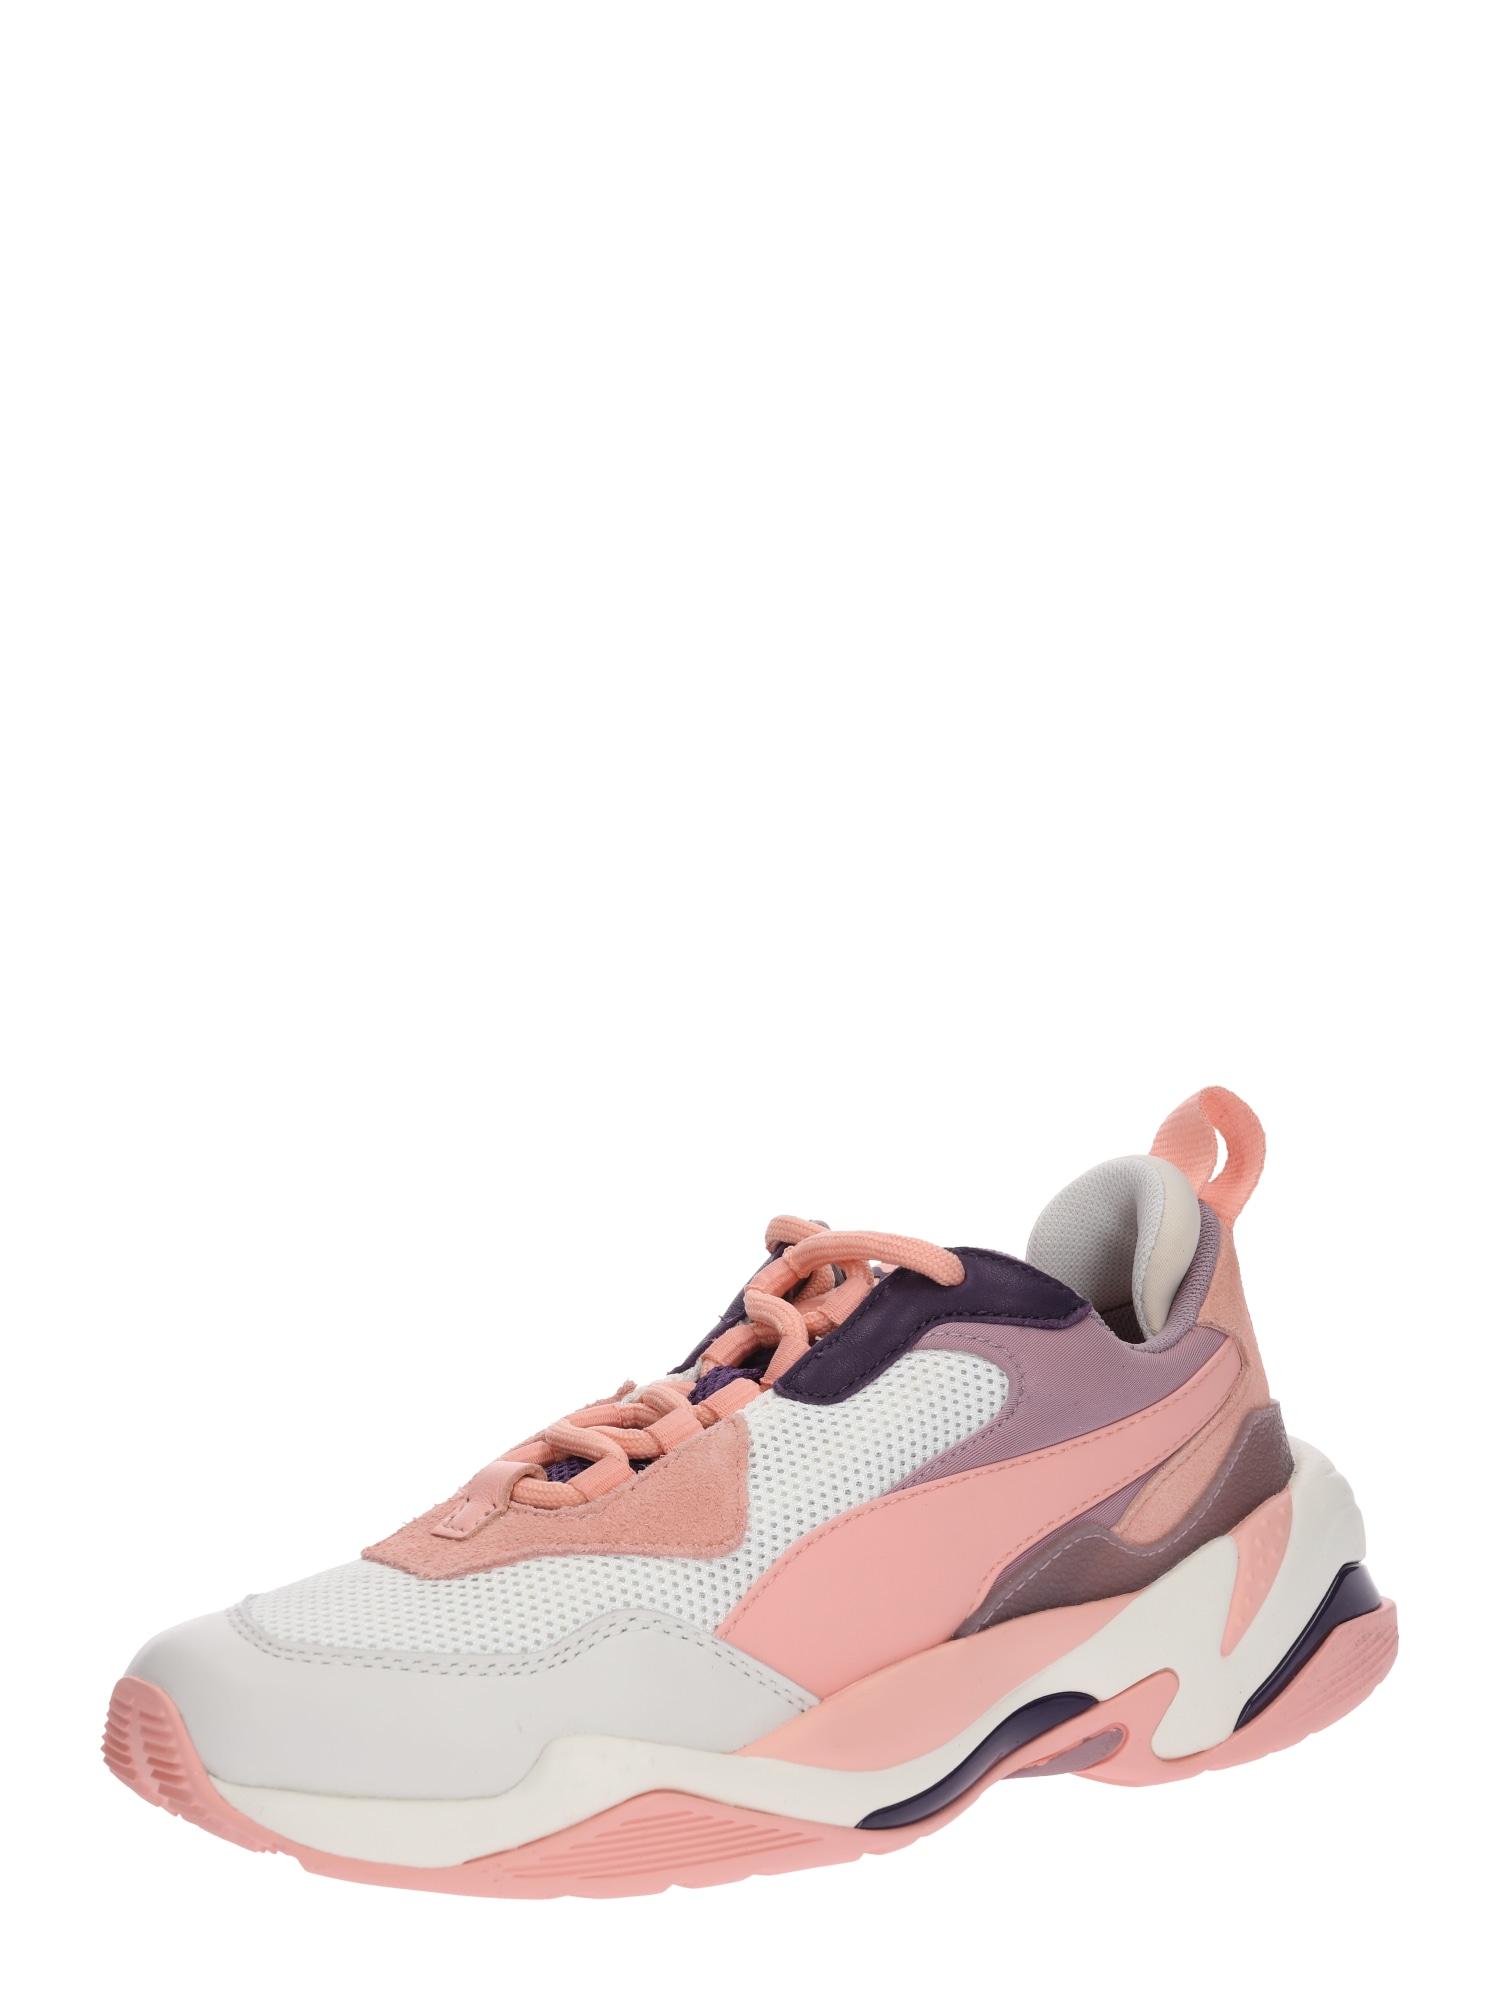 PUMA, Dames Sneakers laag 'Thunder Fashion 1', aubergine / perzik / rosa / wit